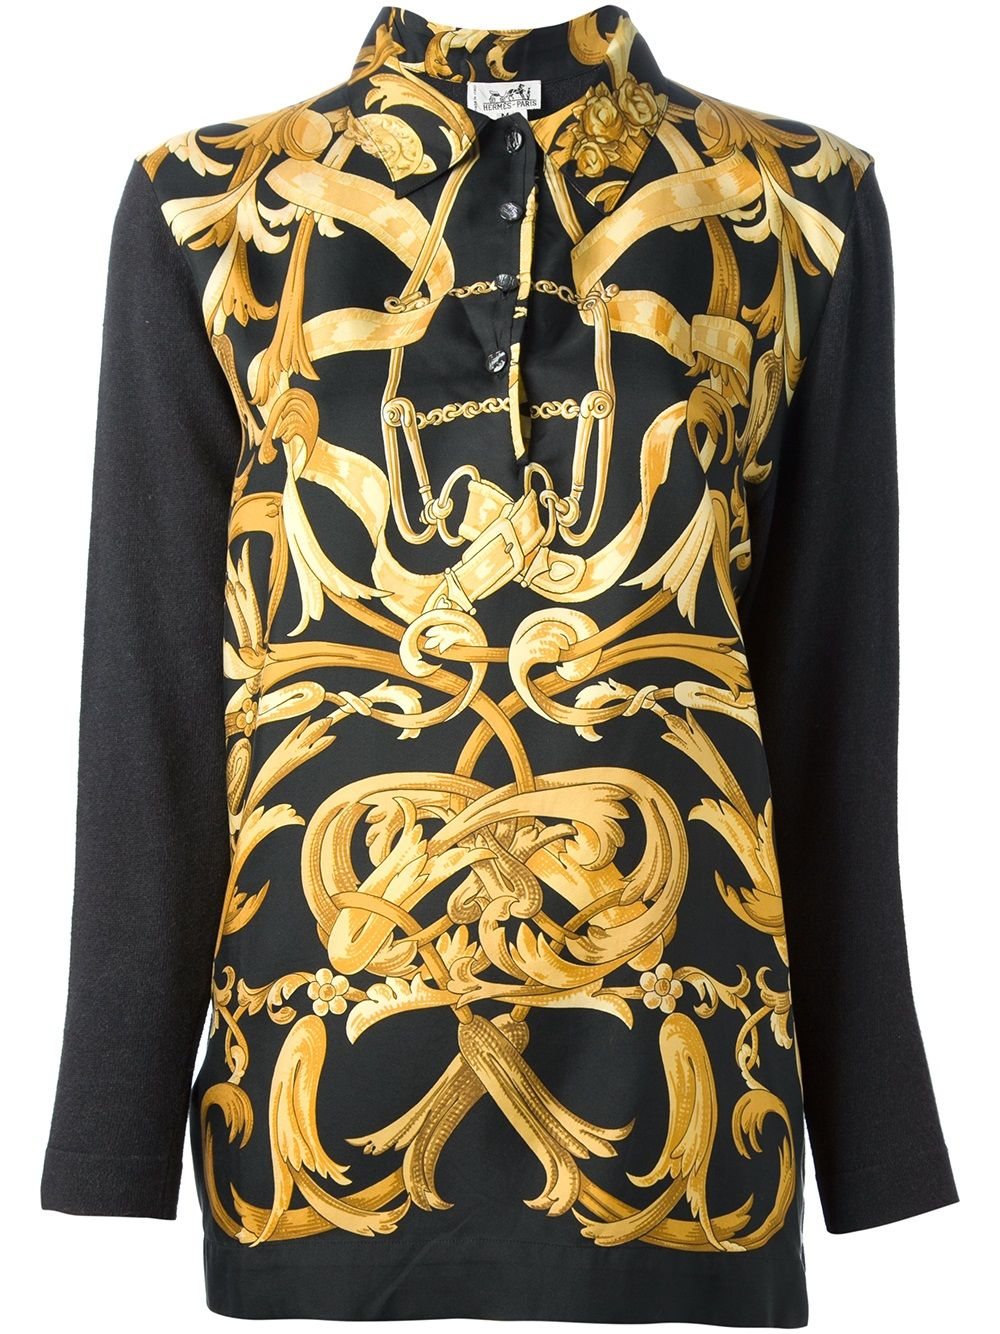 #hermès-vintage-shirt-camicia